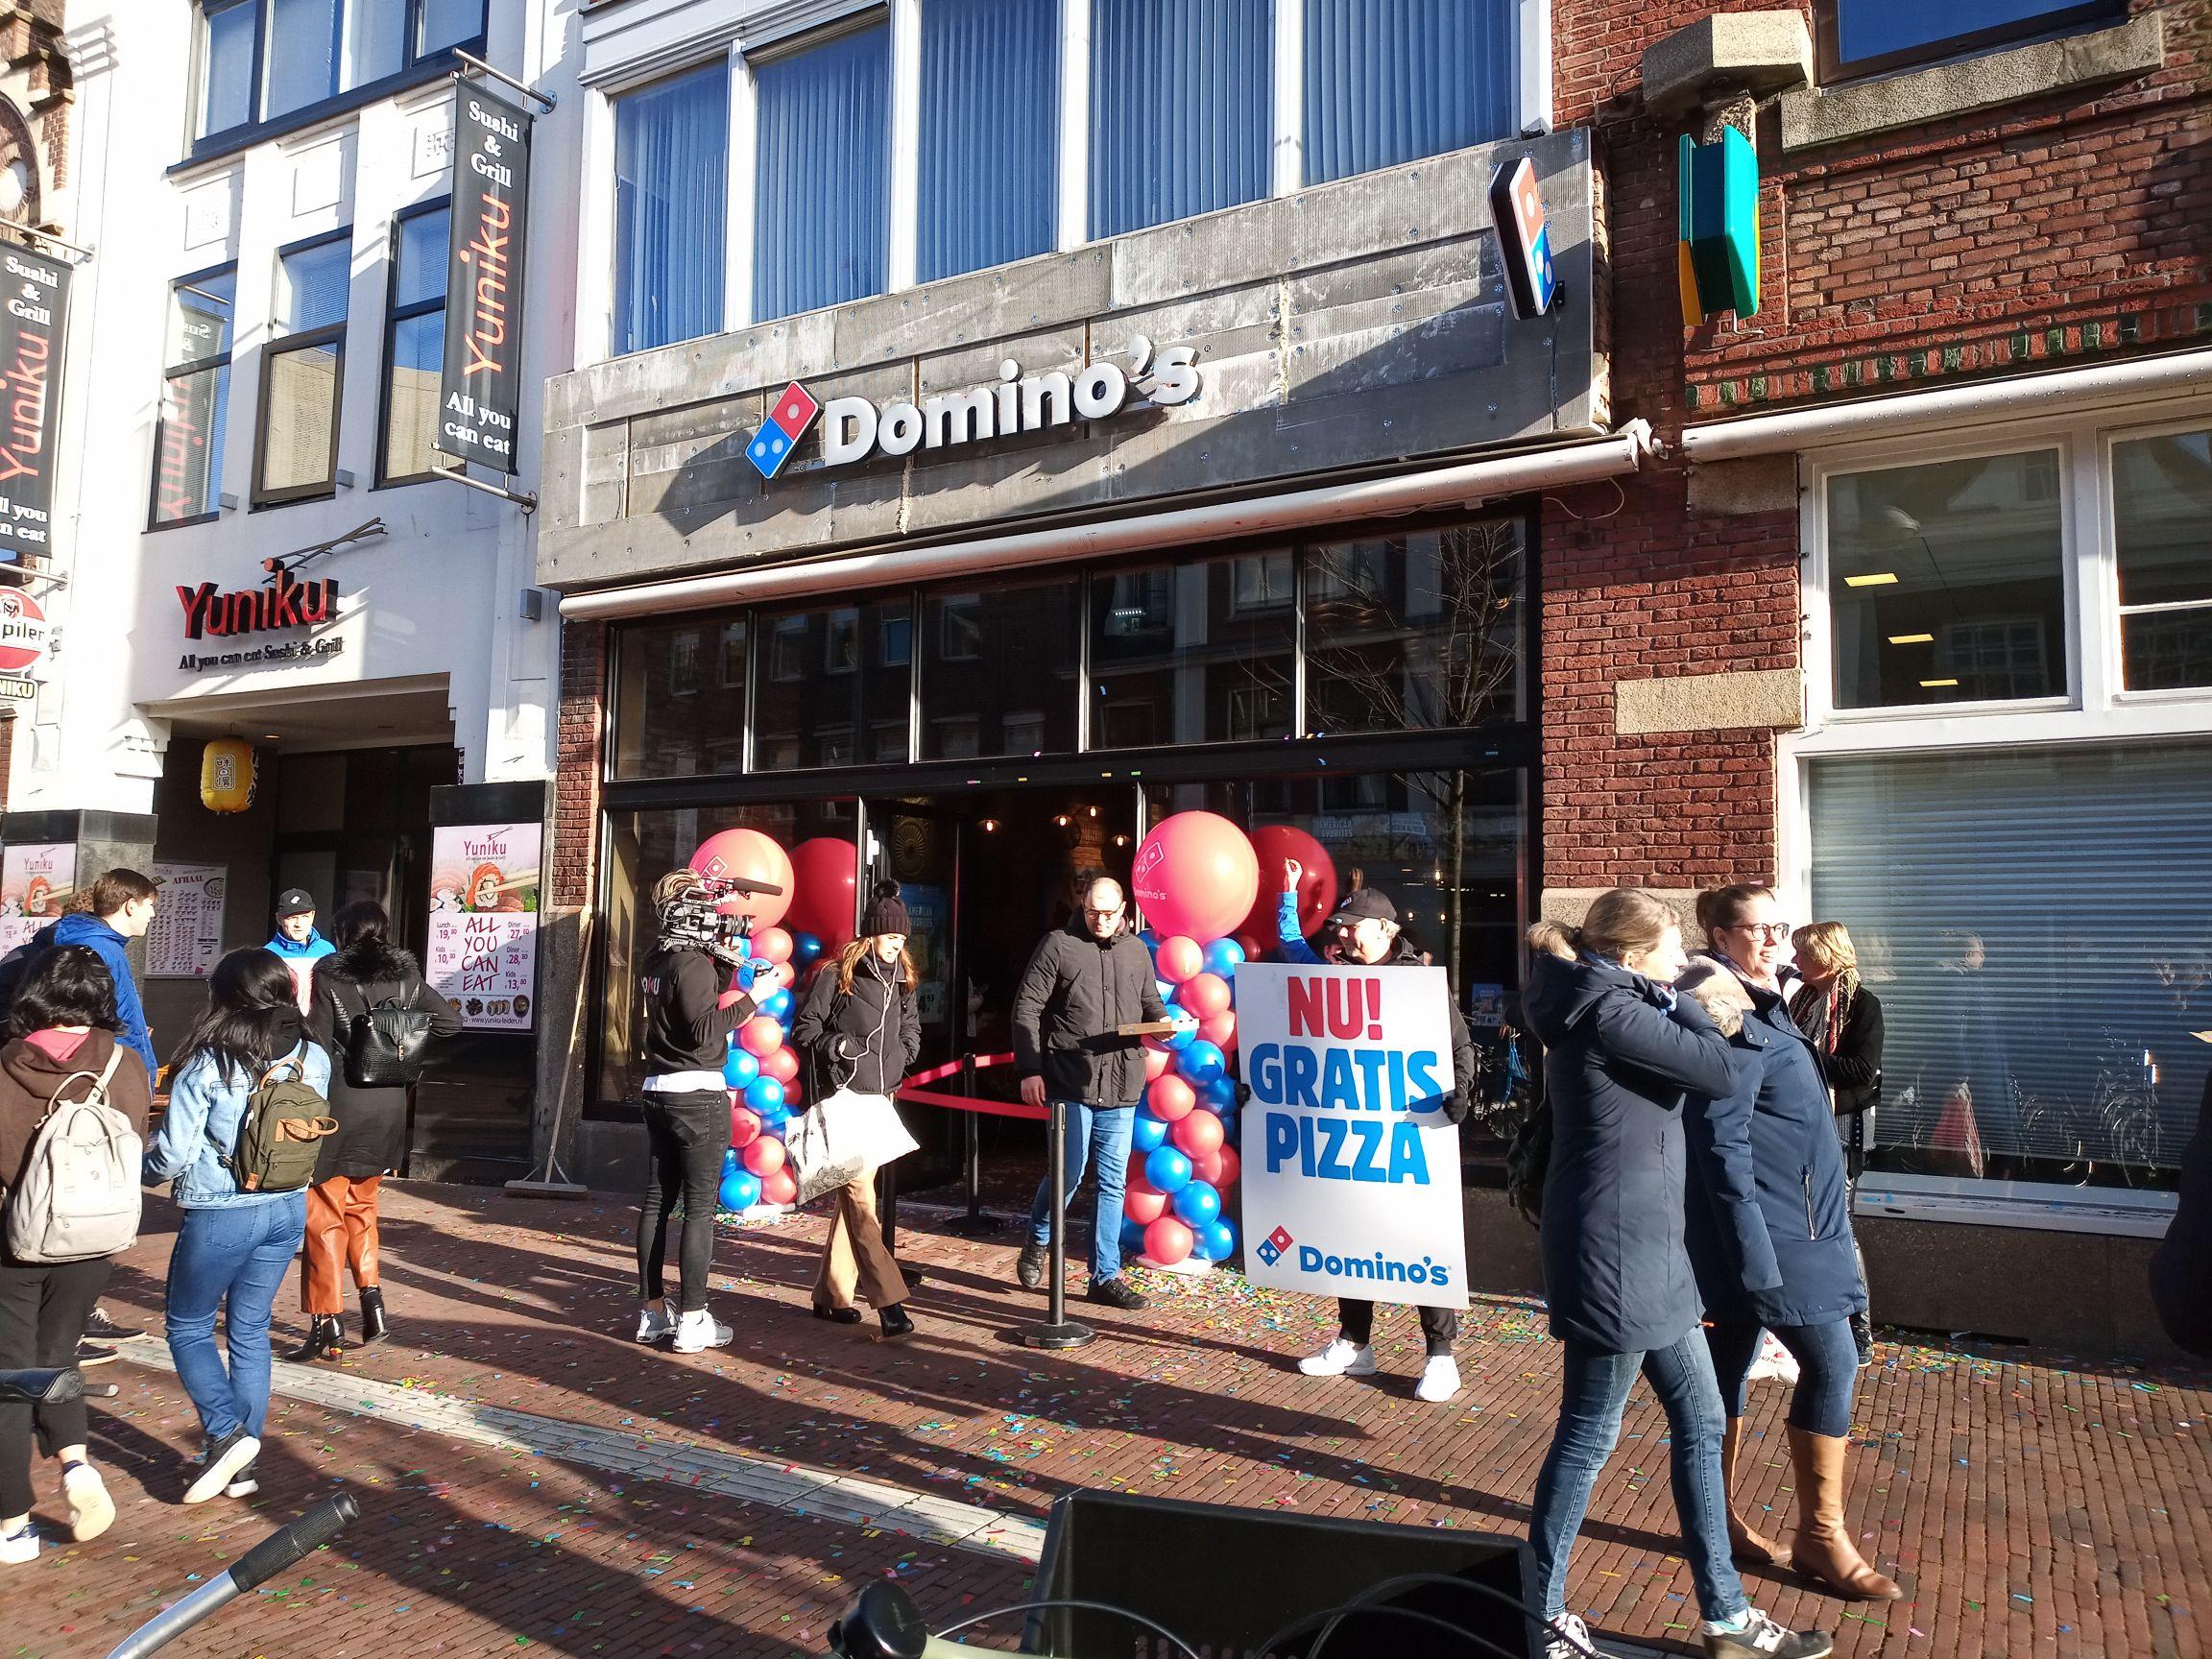 Gratis Domino's pizza @LeidenStation